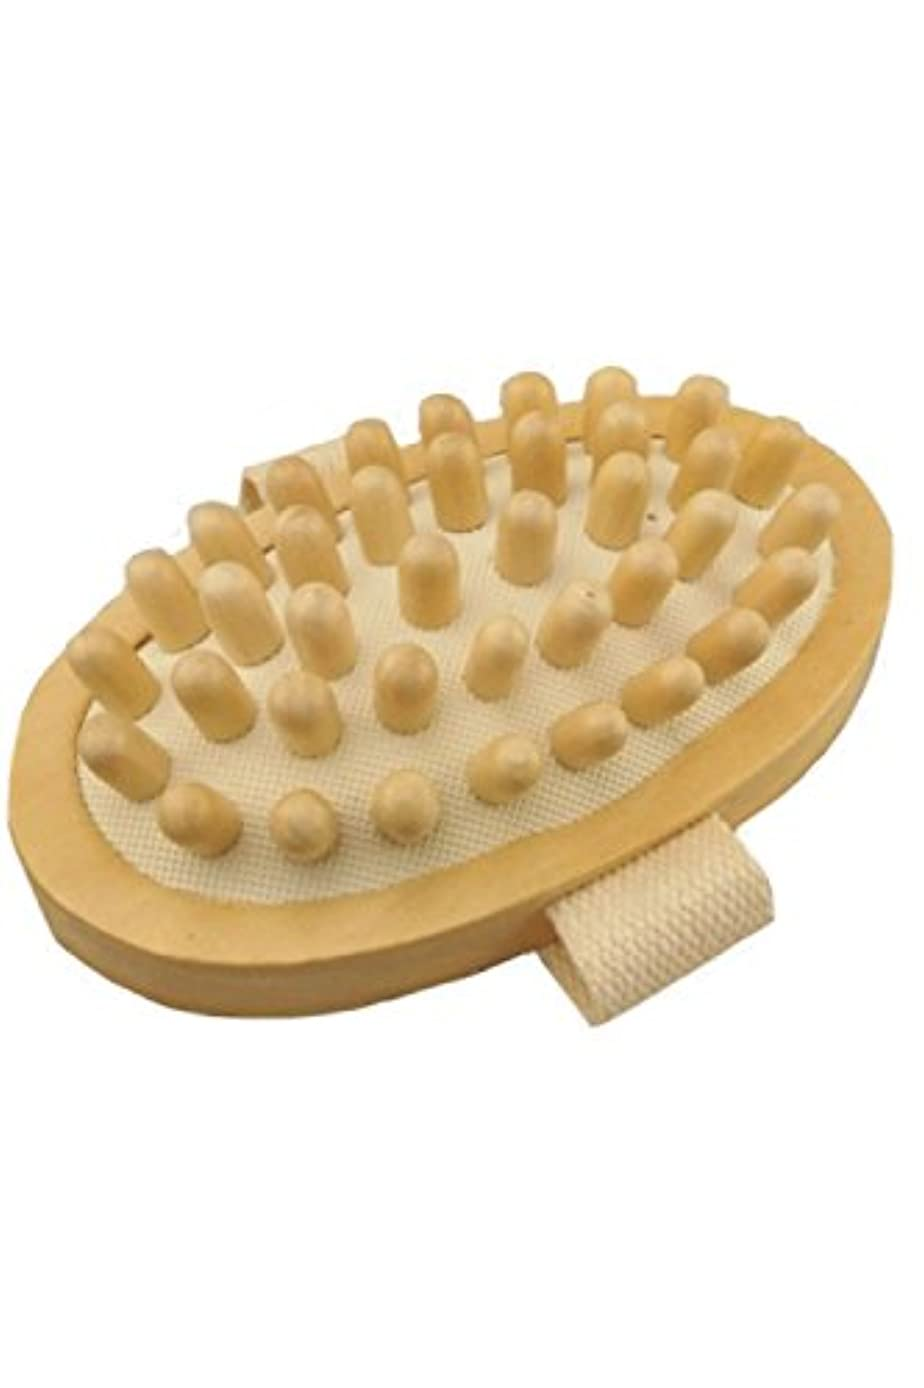 (POMAIKAI) マッサージブラシ ボディ セルライト リンパ ボディーブラシ むくみ解消 お腹 足 脚 マッサージ 1個